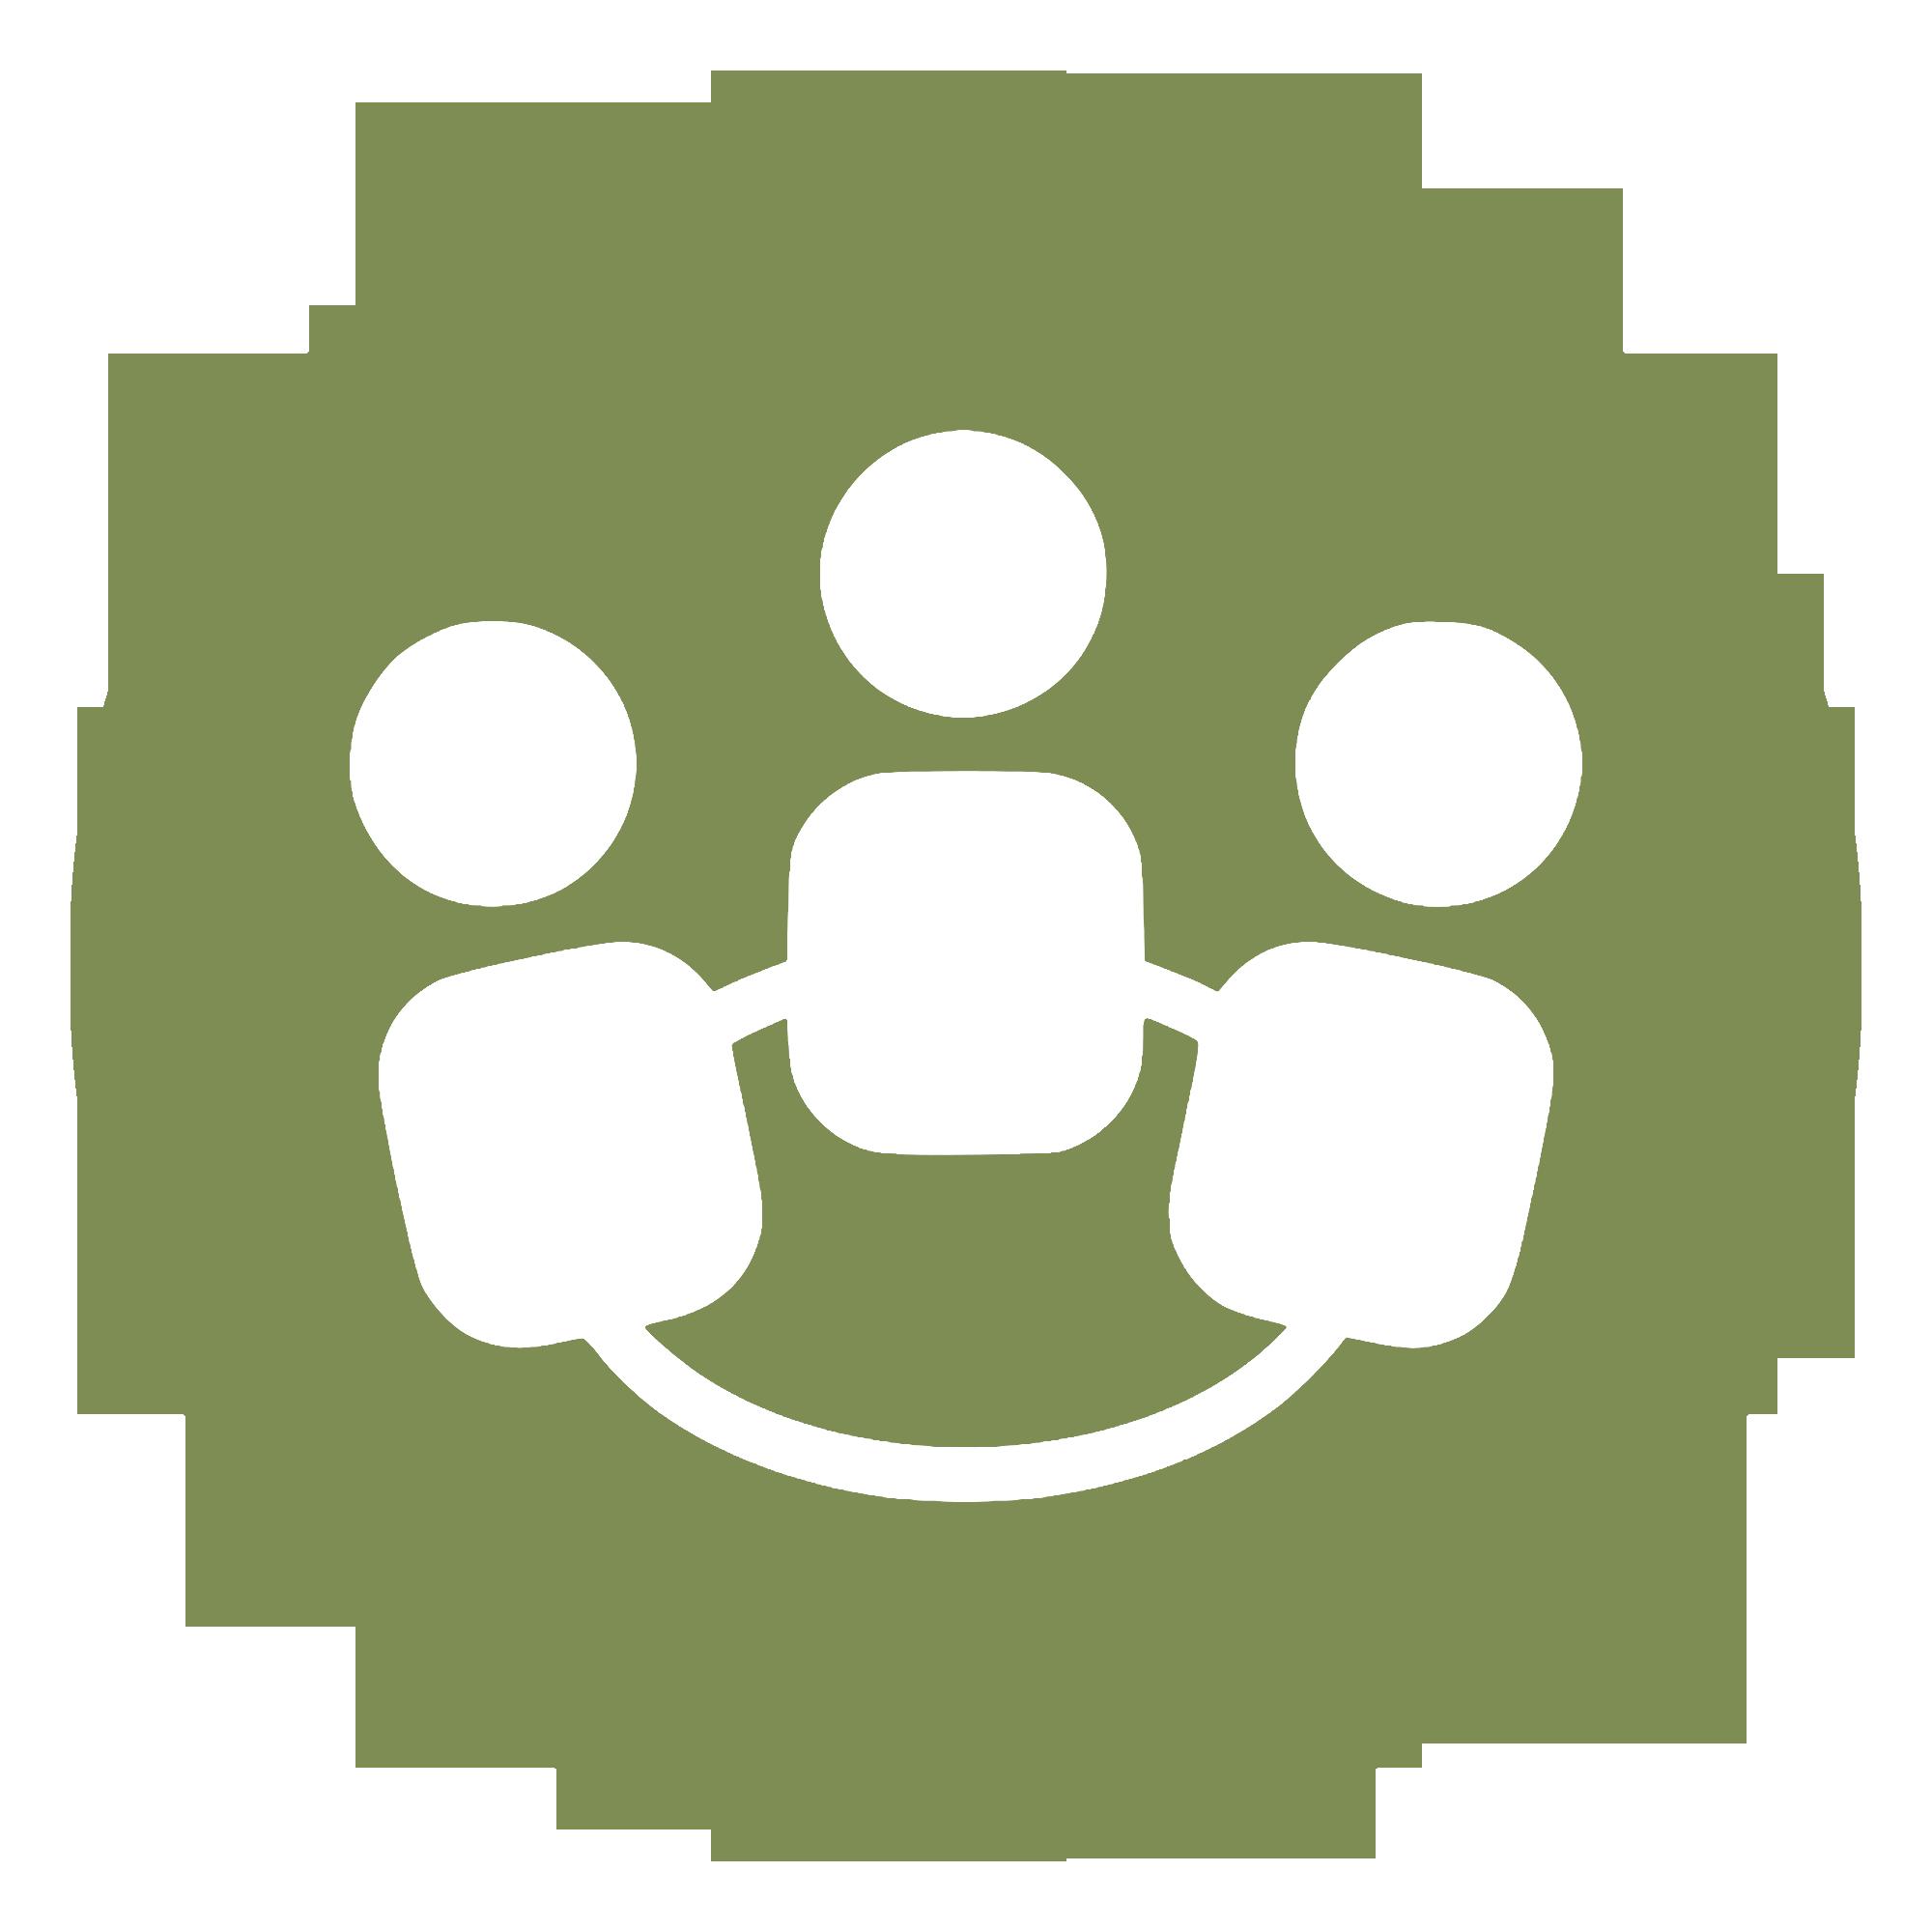 SUB_ICON-COMMUNITY_1.png